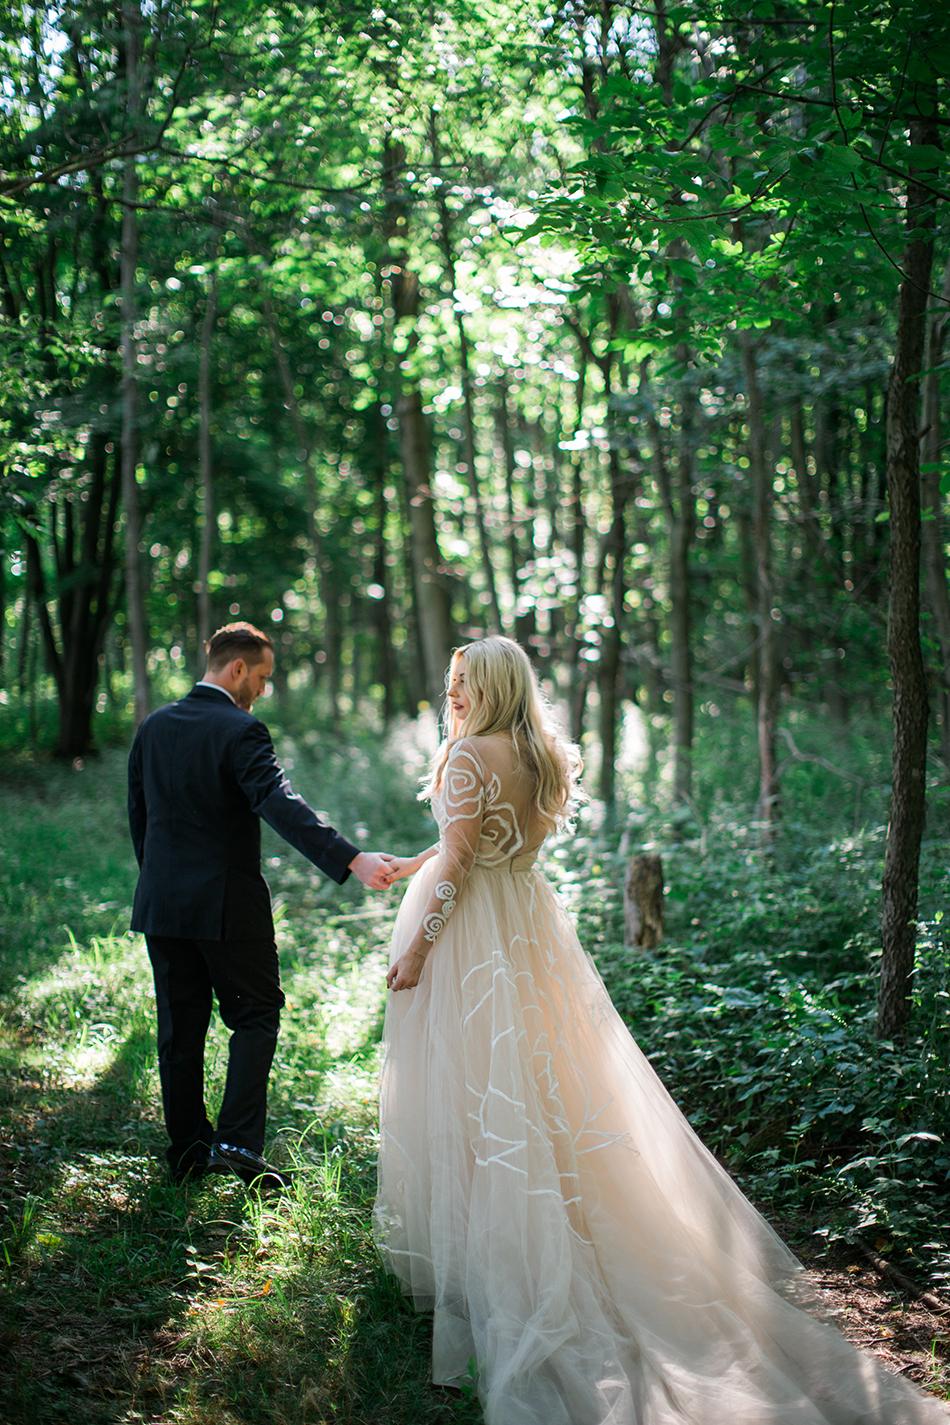 Bohemian bride wearing a Jim Hjelm by Hayley Paige wedding gown at La Esposita Bonita in Varysburg, NY